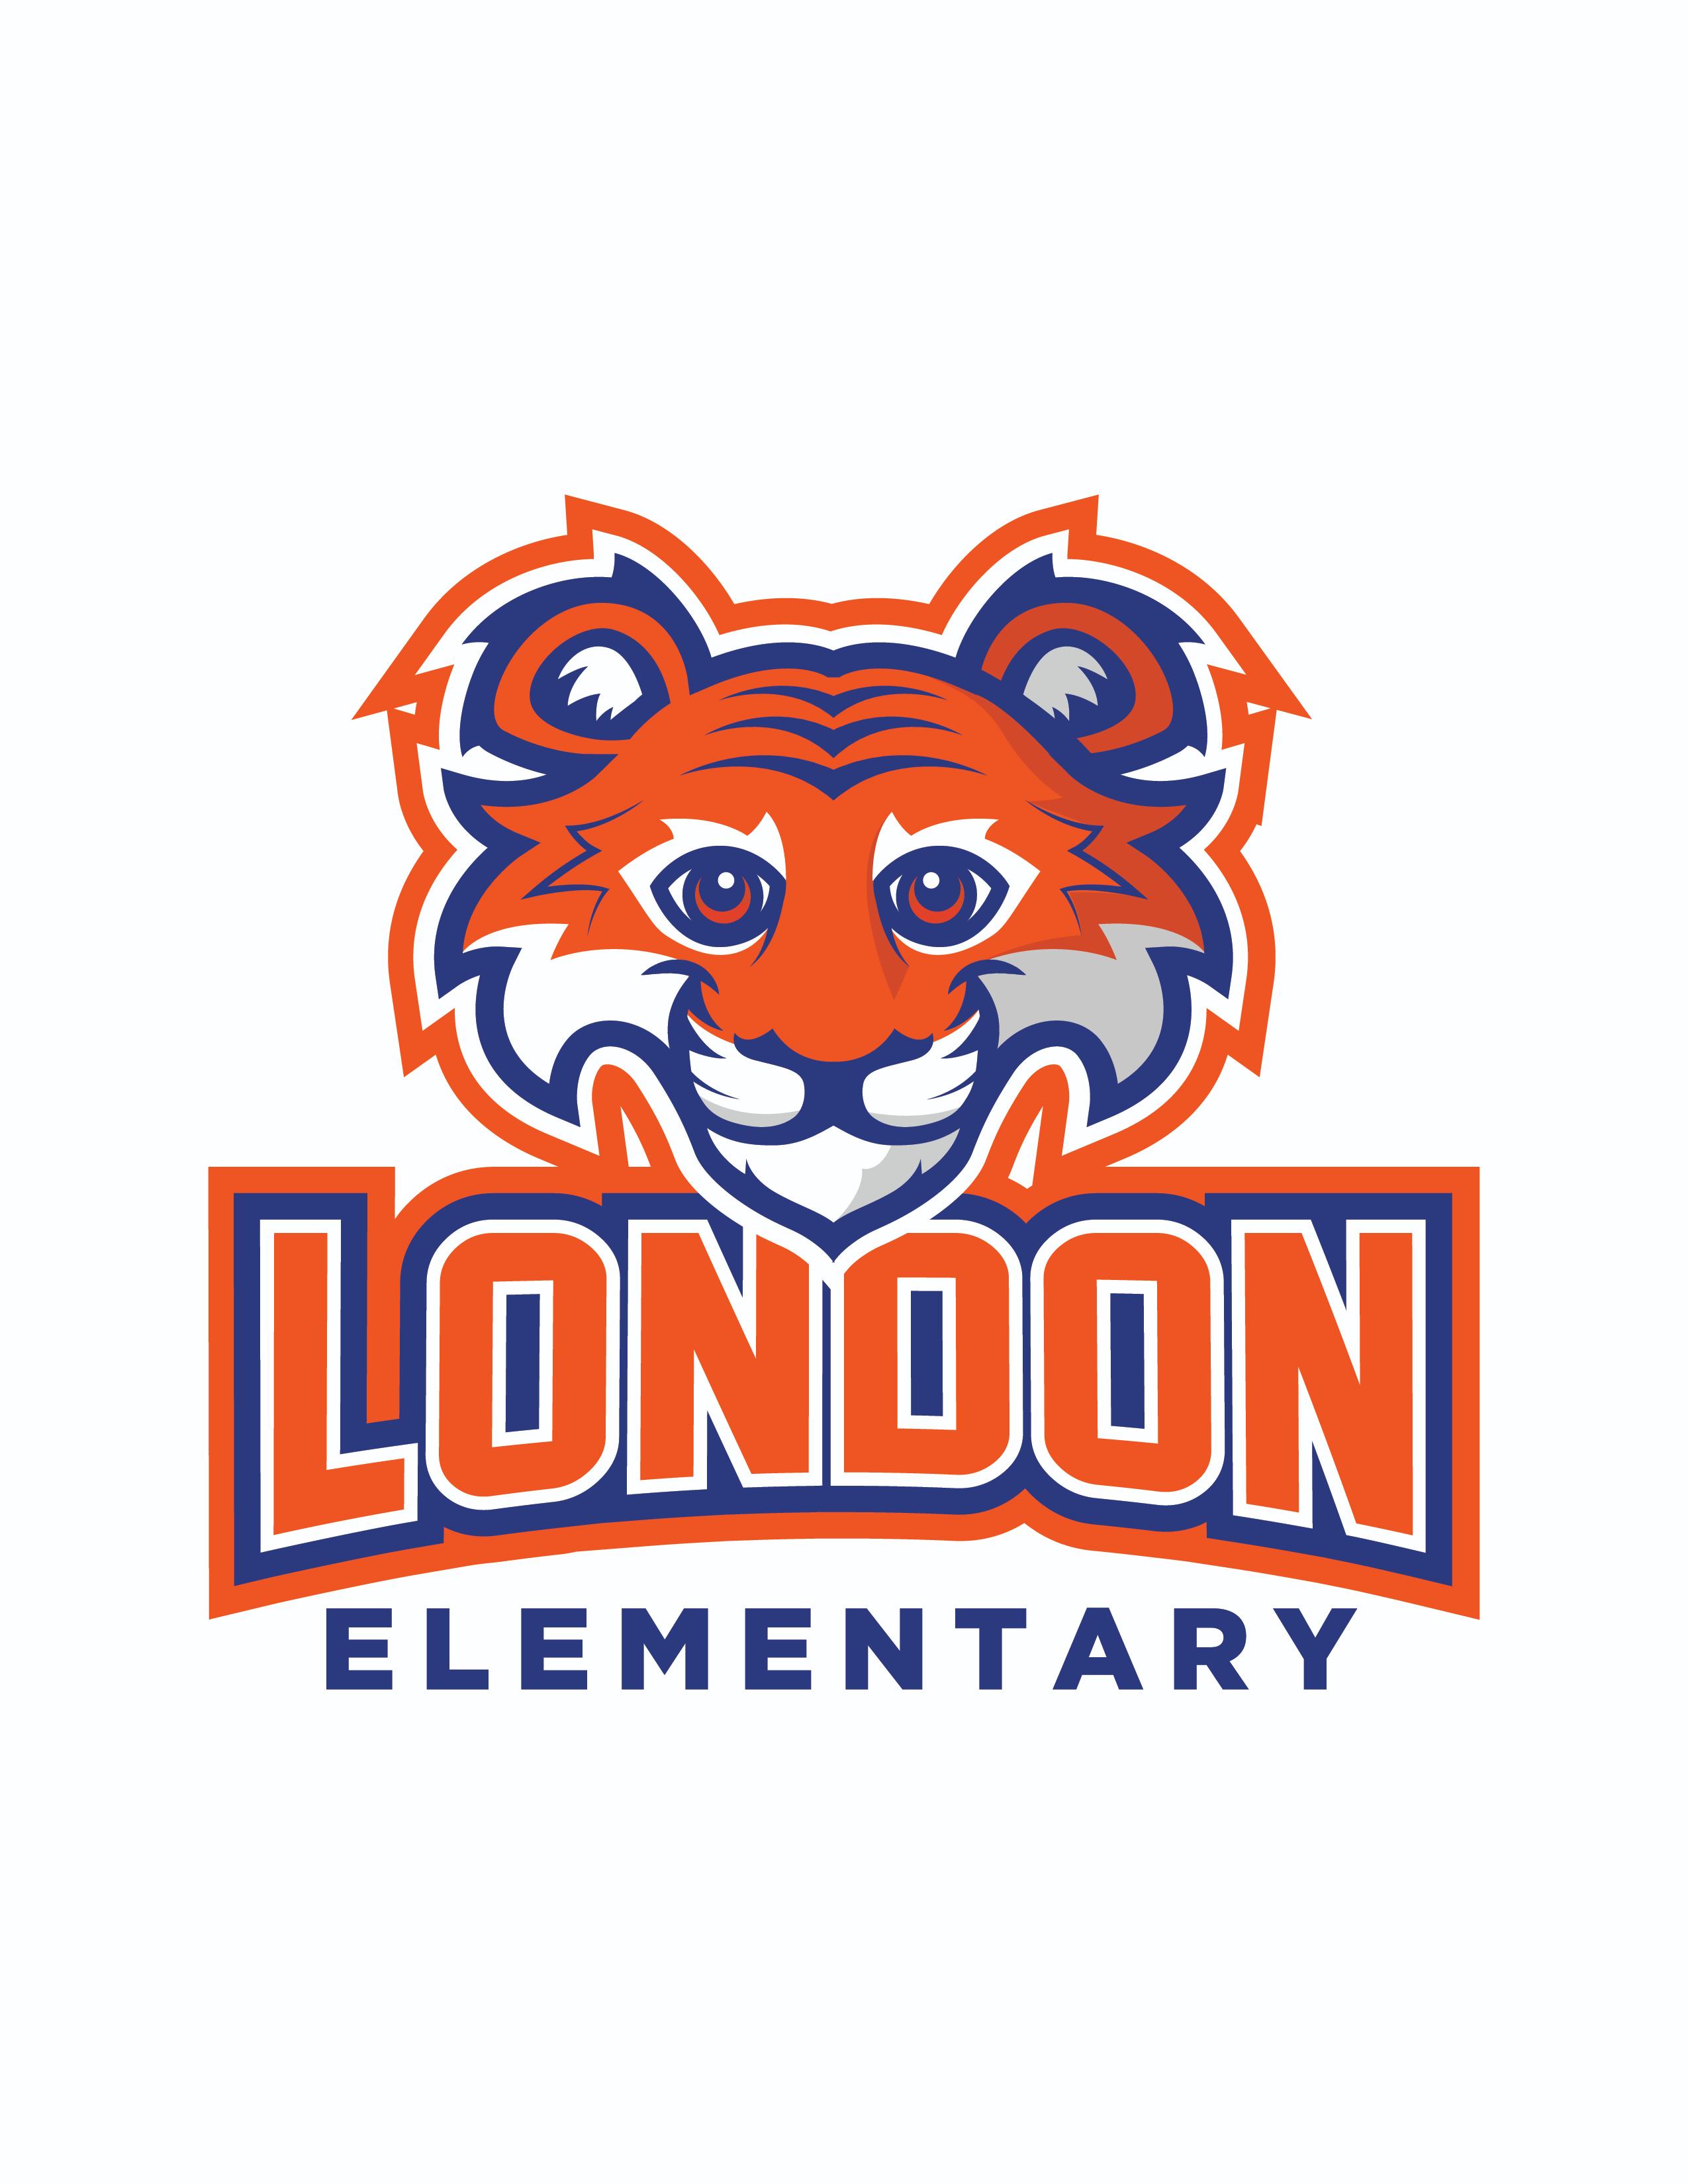 London Elementary logo